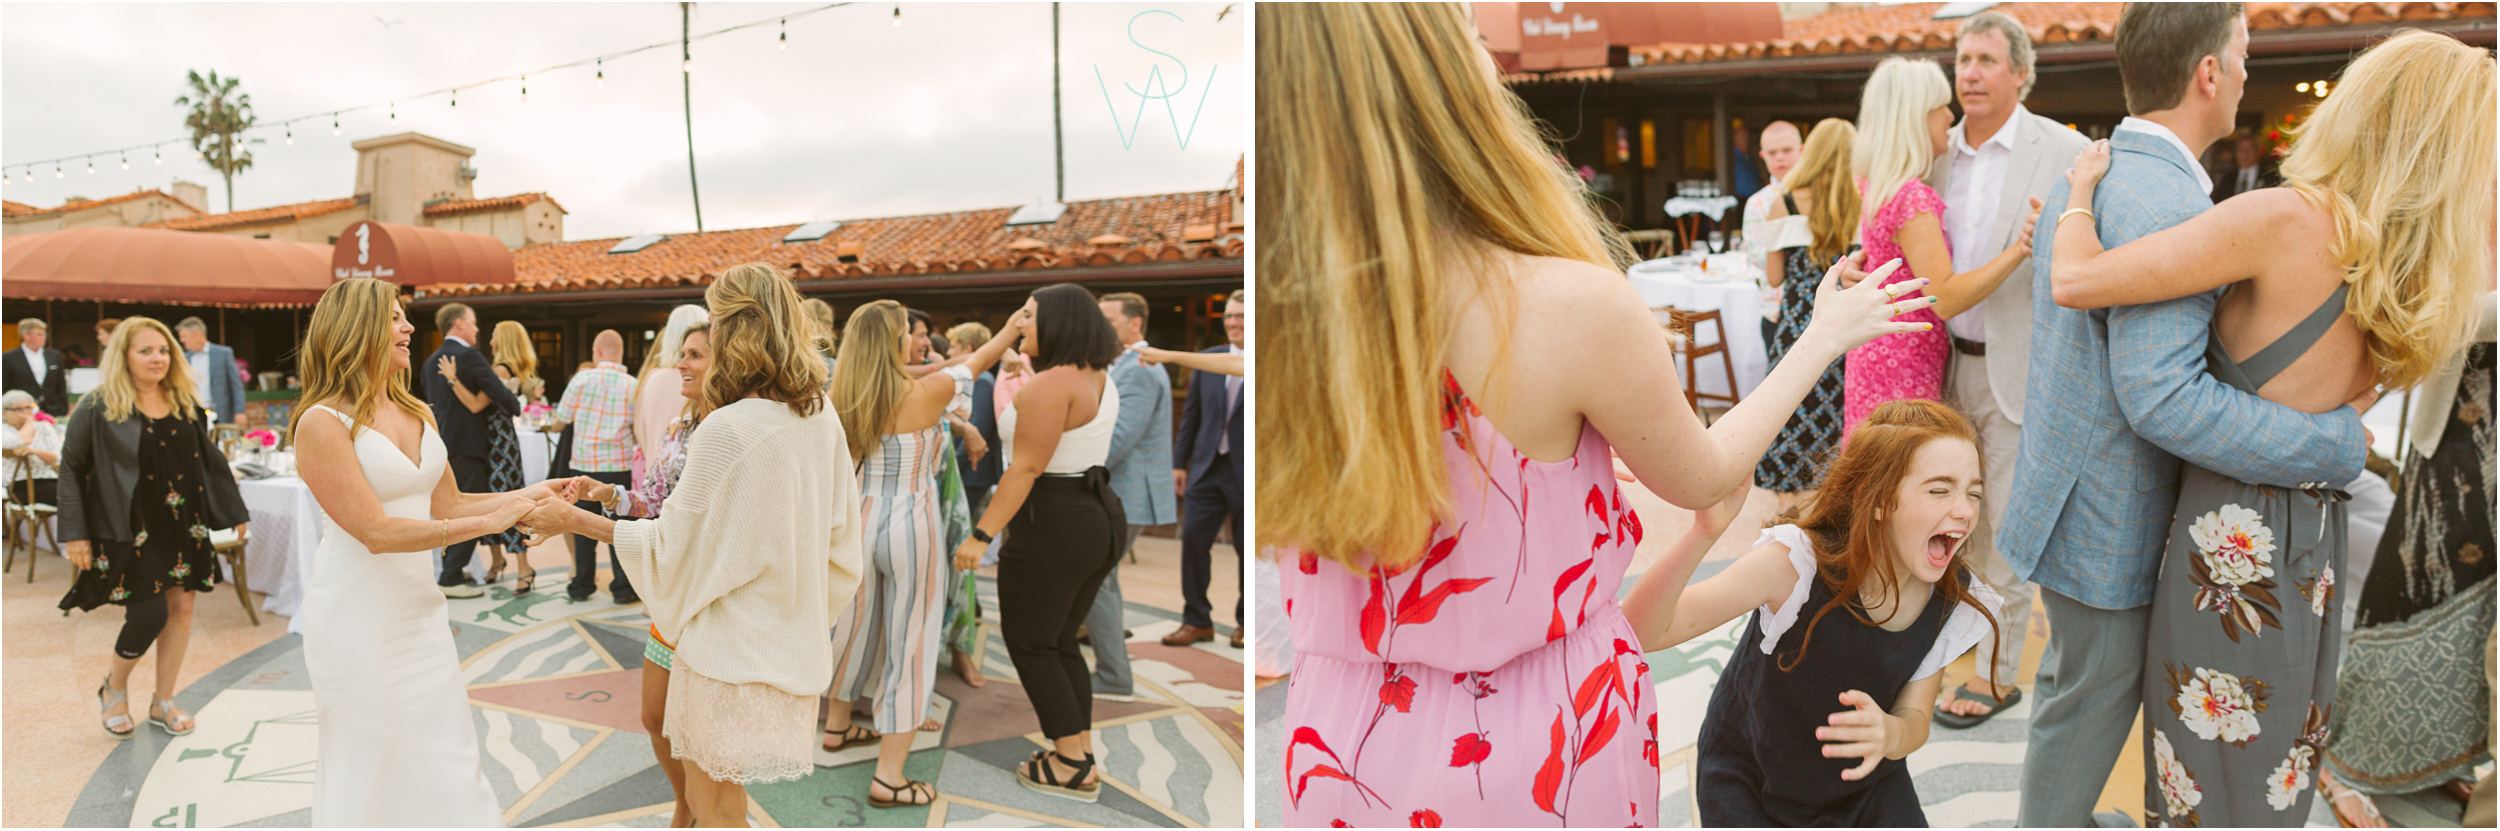 shewanders.wedding.photography.la.jolla-1061.jpg